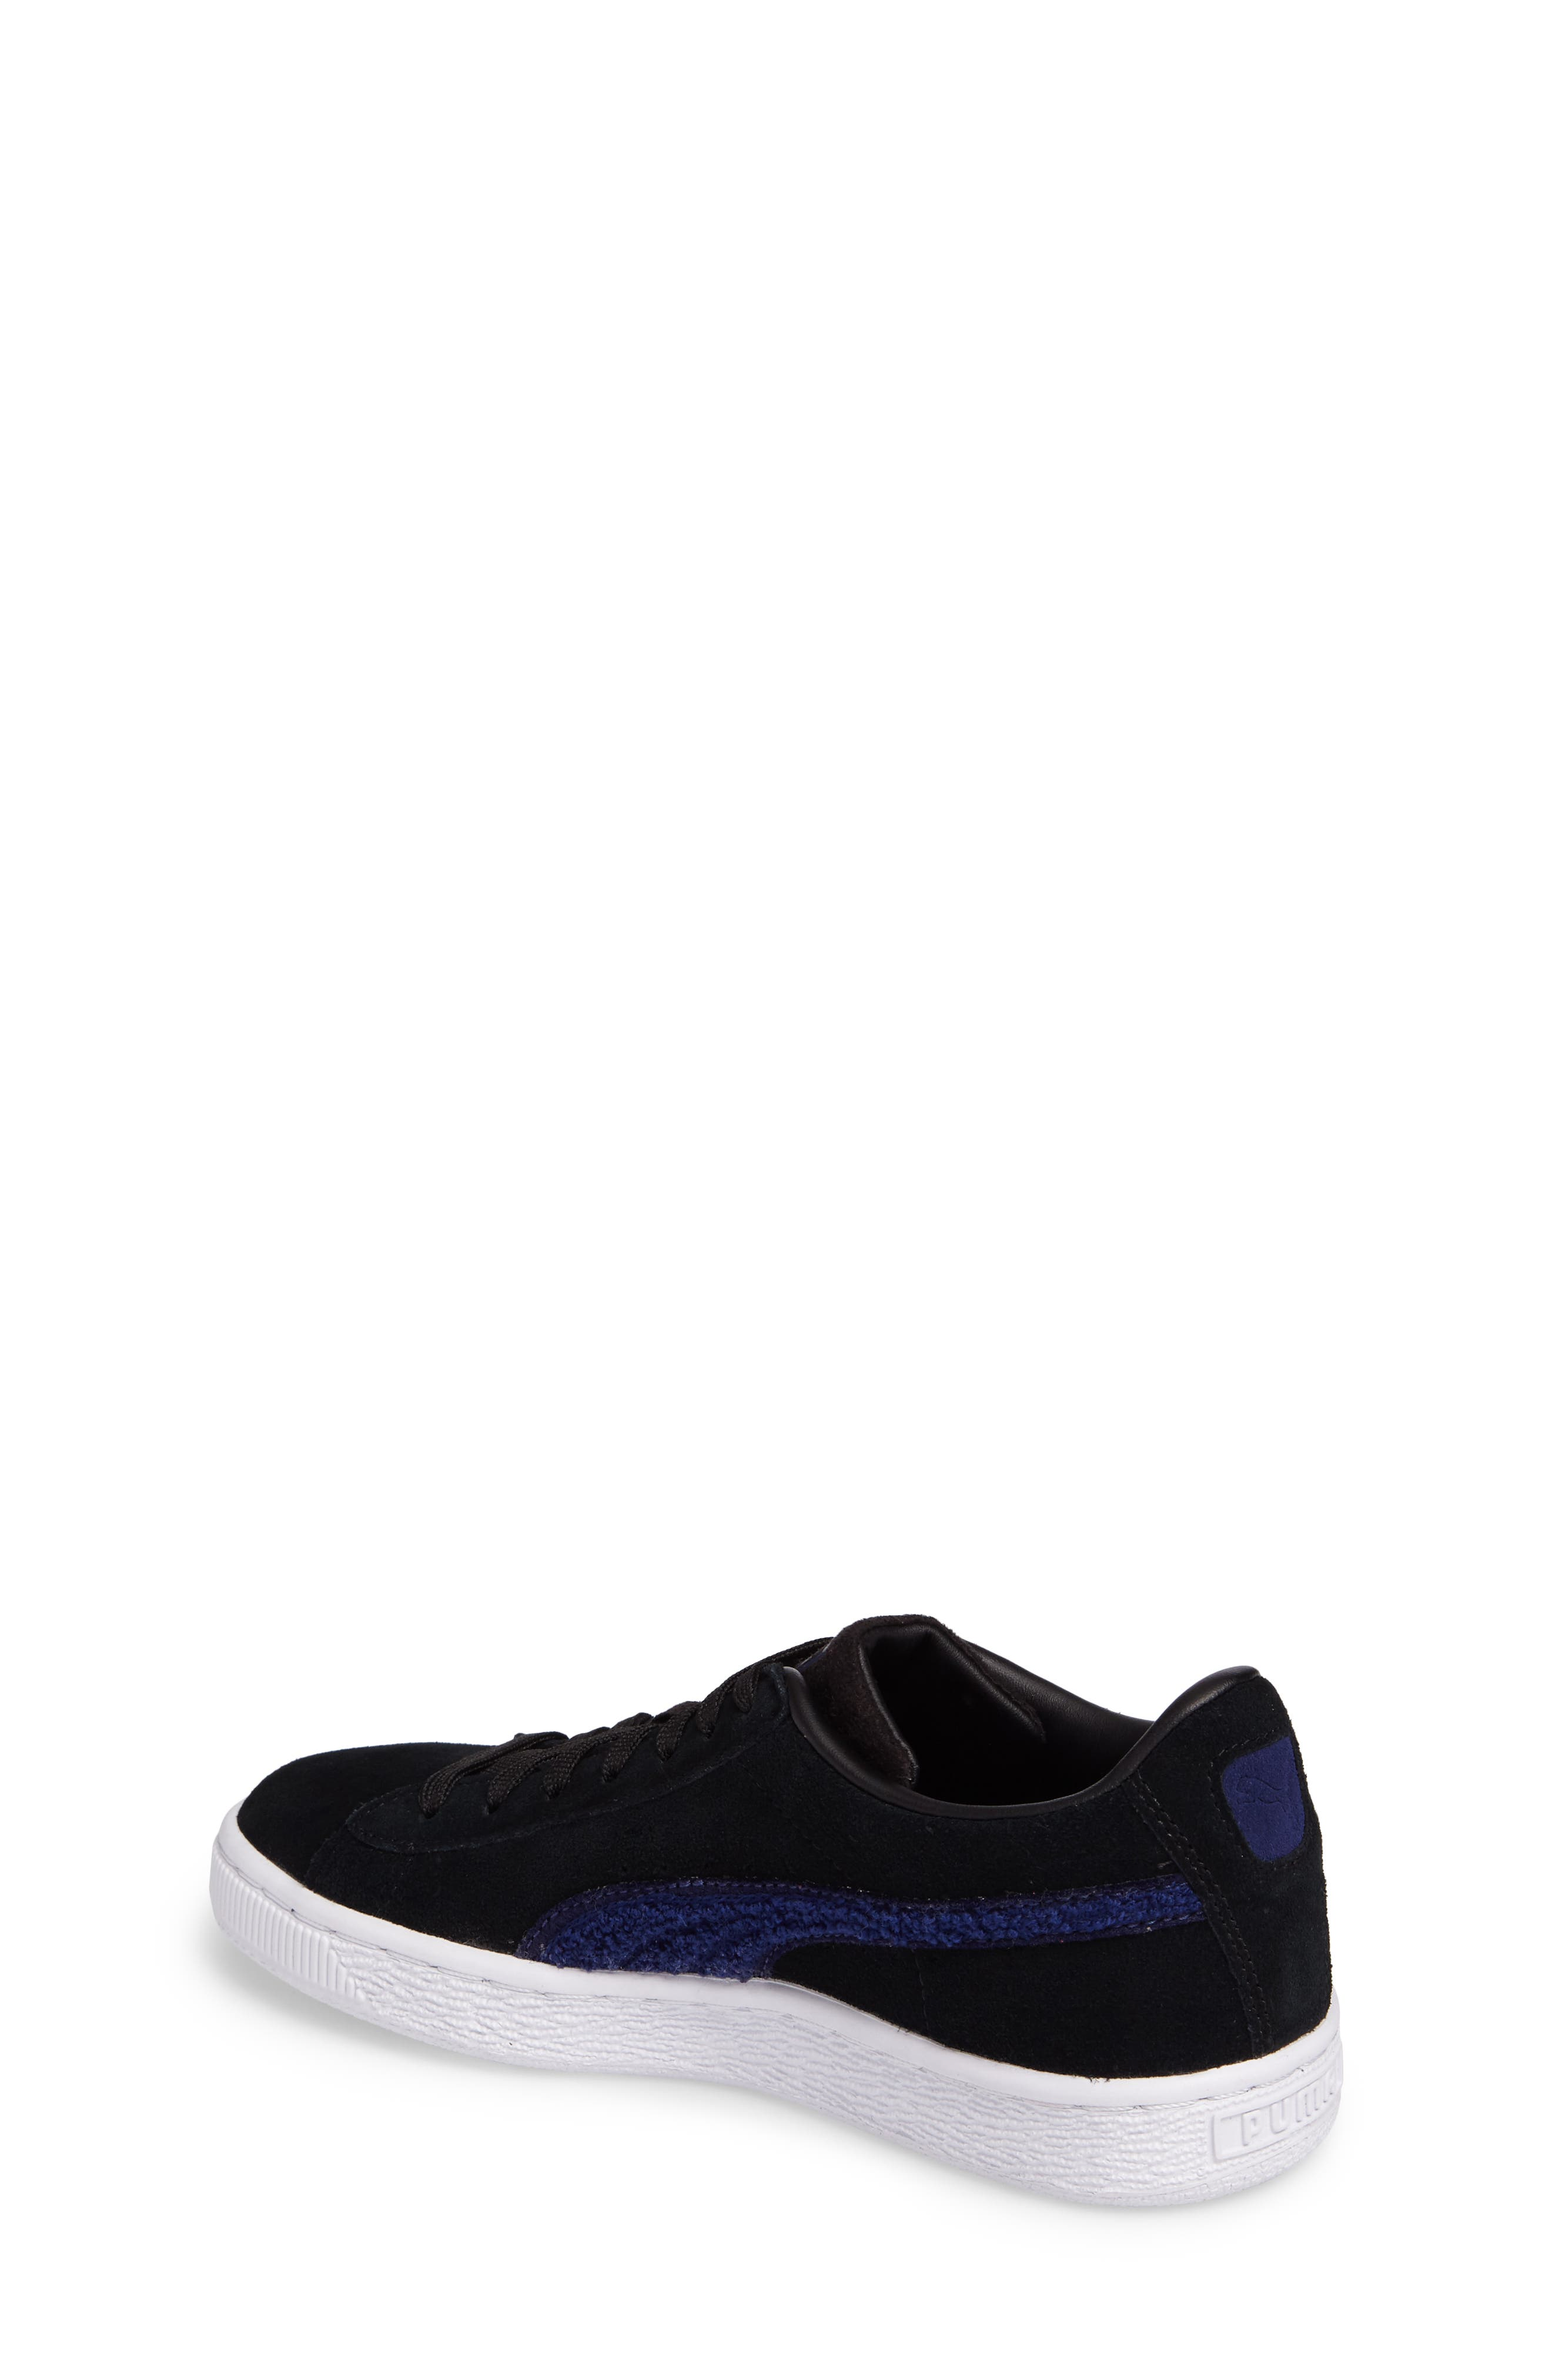 Classic Terry Jr Sneaker,                             Alternate thumbnail 2, color,                             001